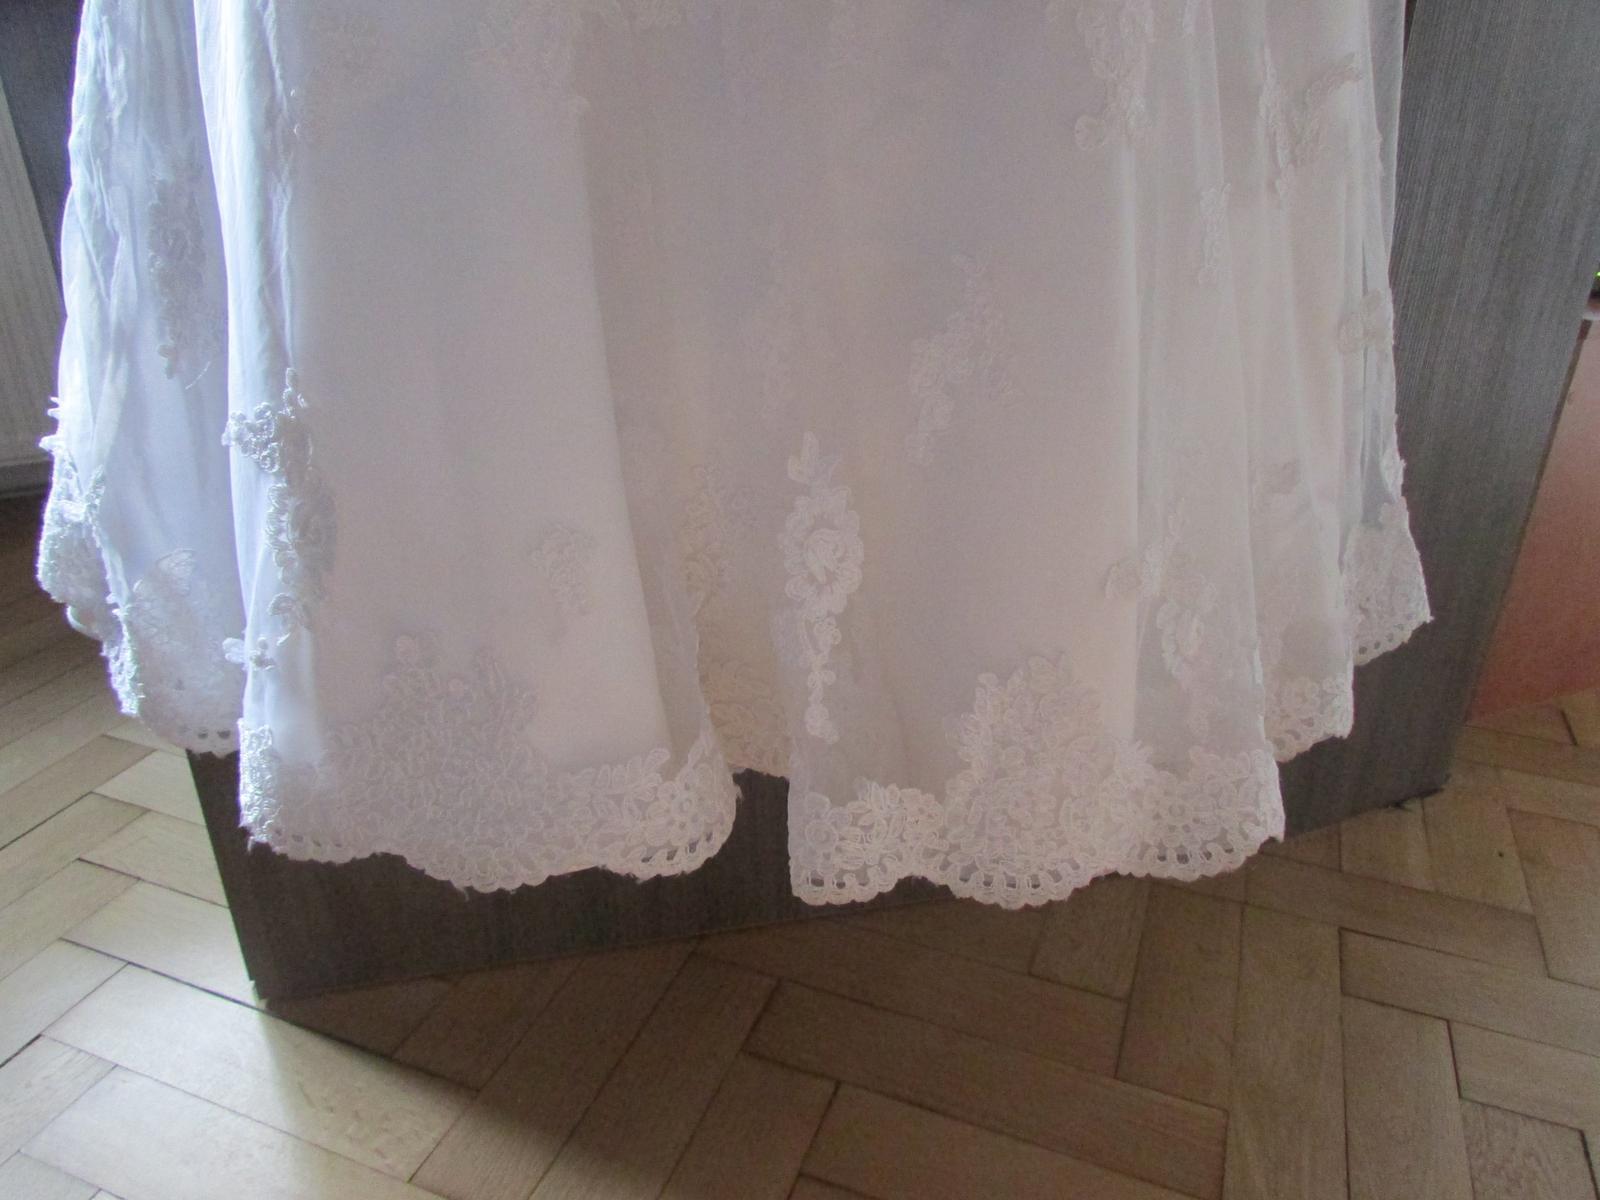 svadobné šaty s čipkovanou vlečkou - Obrázok č. 3